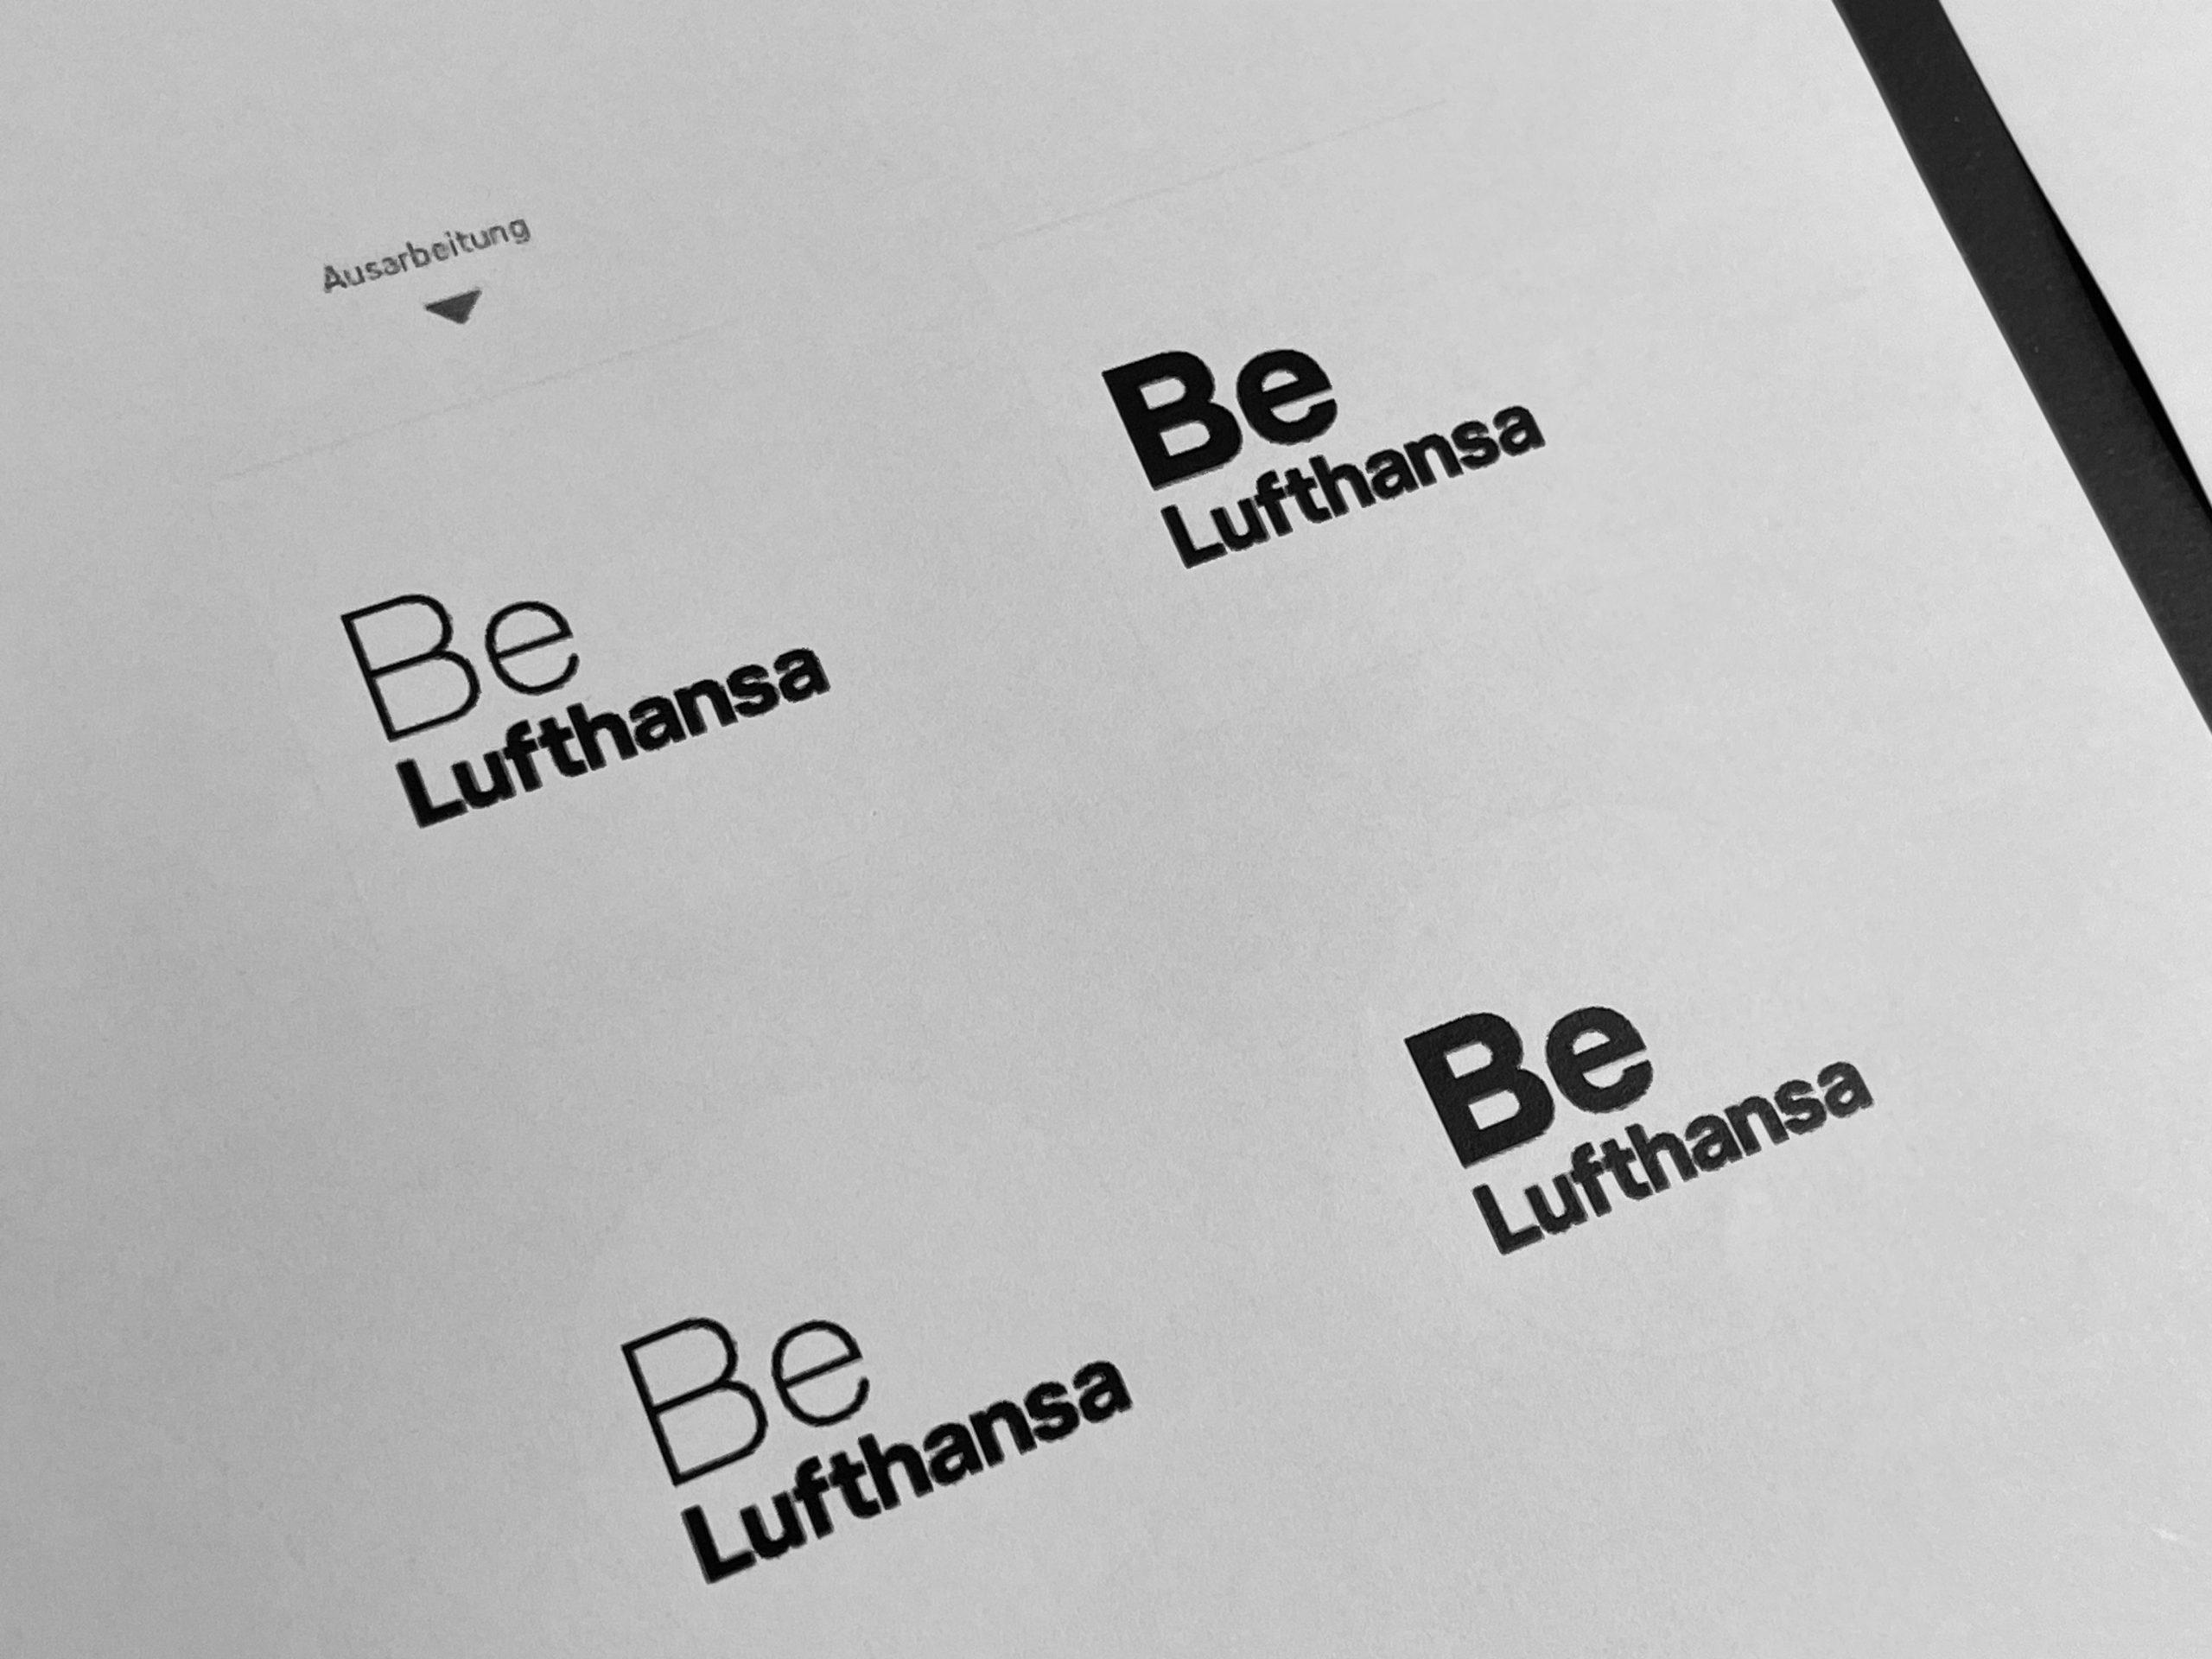 be-lufthansabw_02